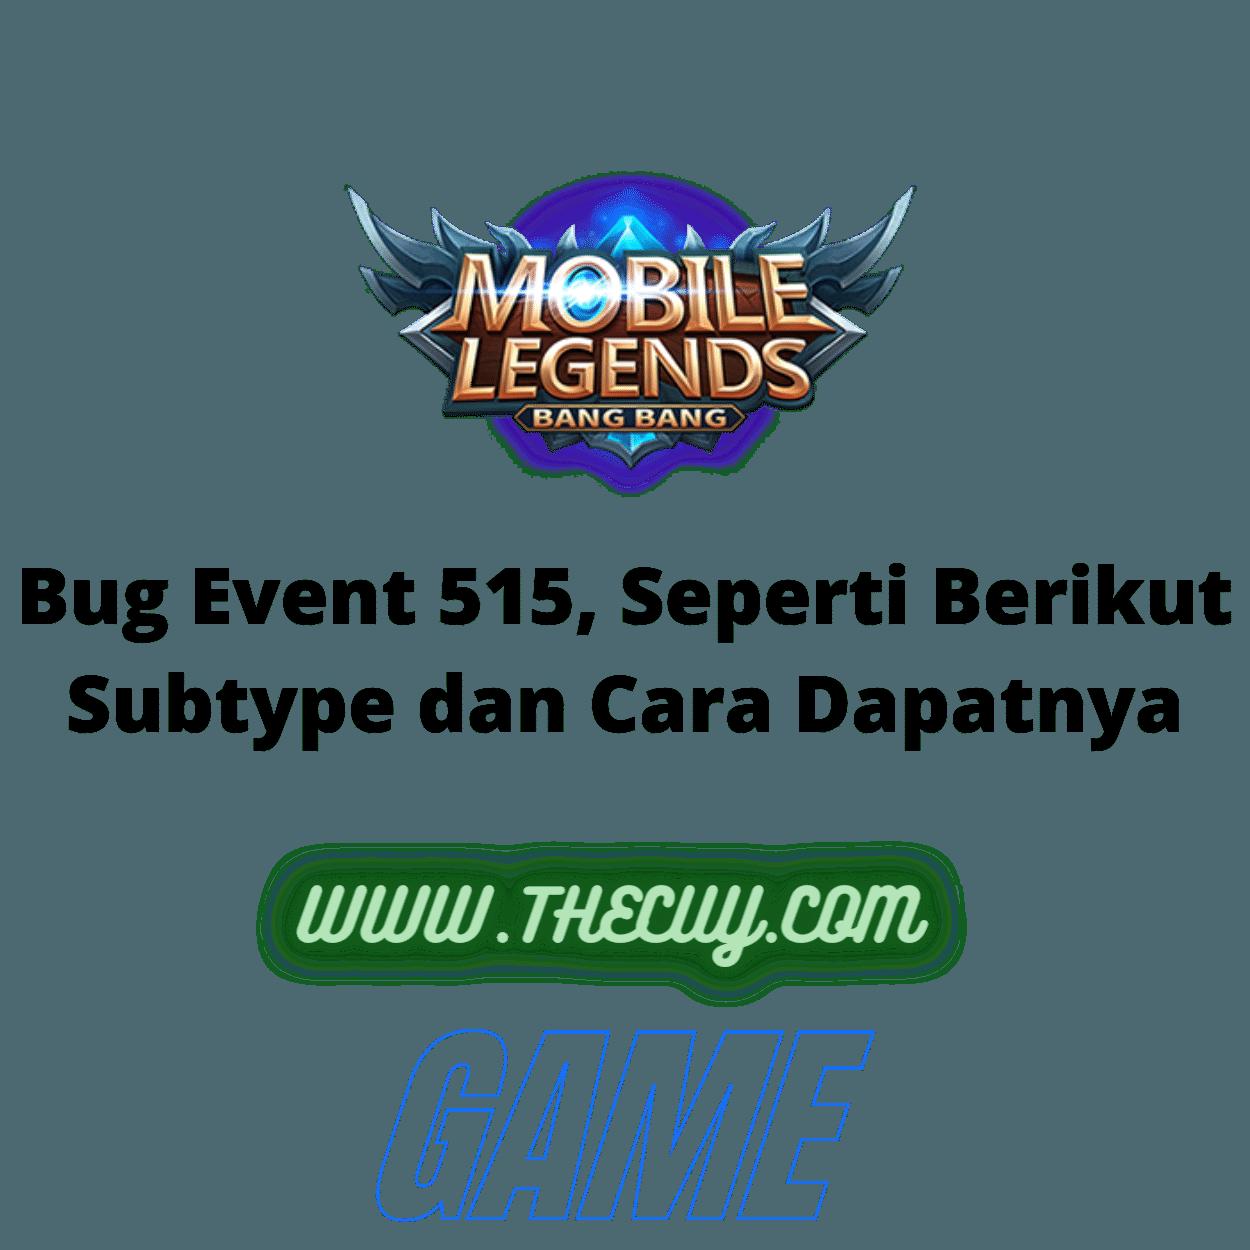 Bug Event 515, Seperti Berikut Subtype dan Cara Dapatnya